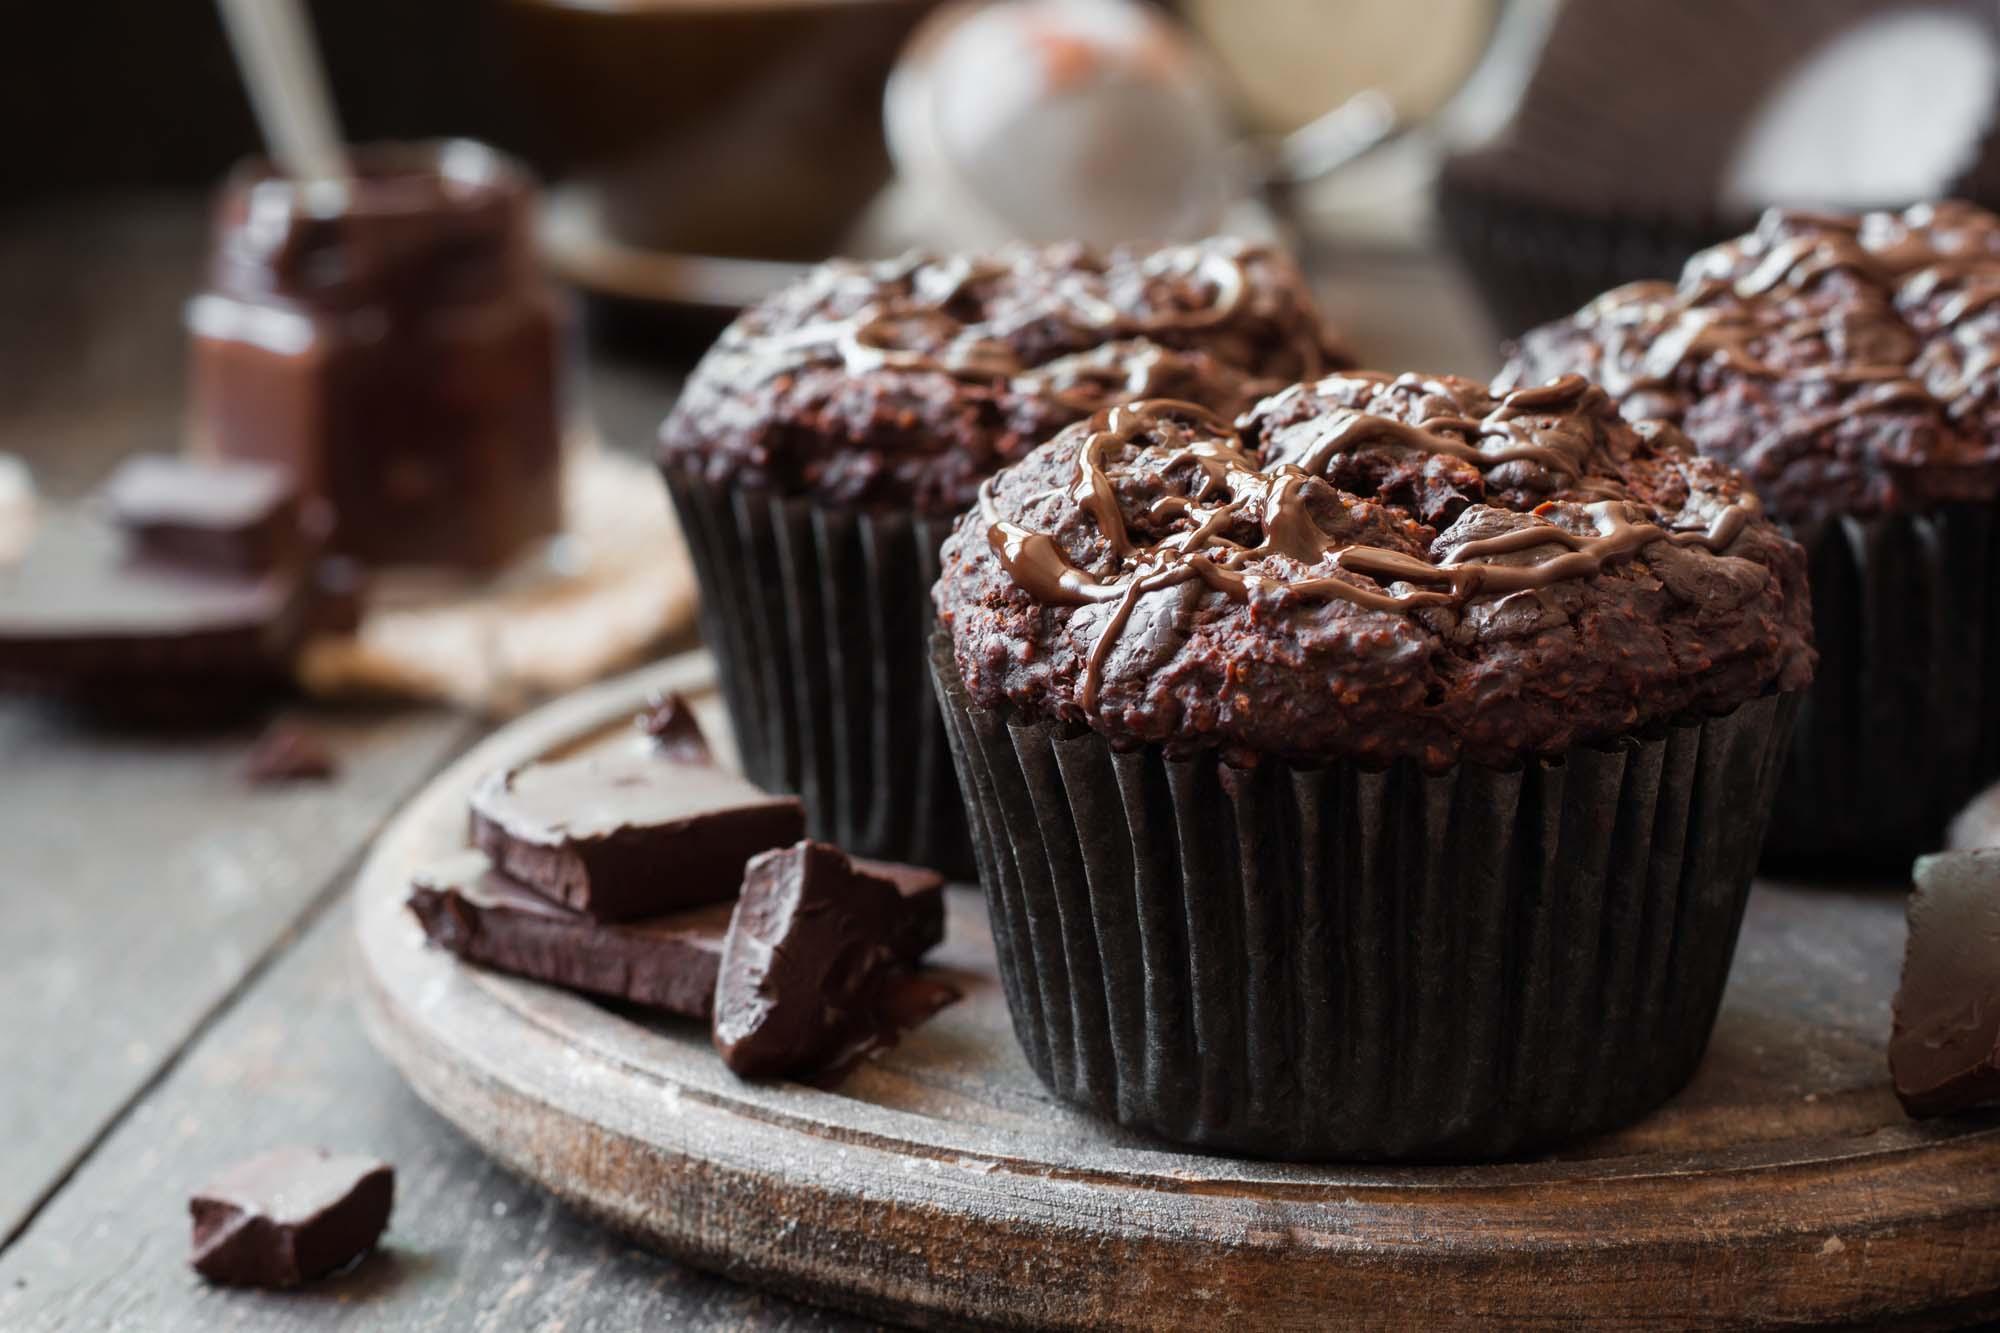 Monikas muffins